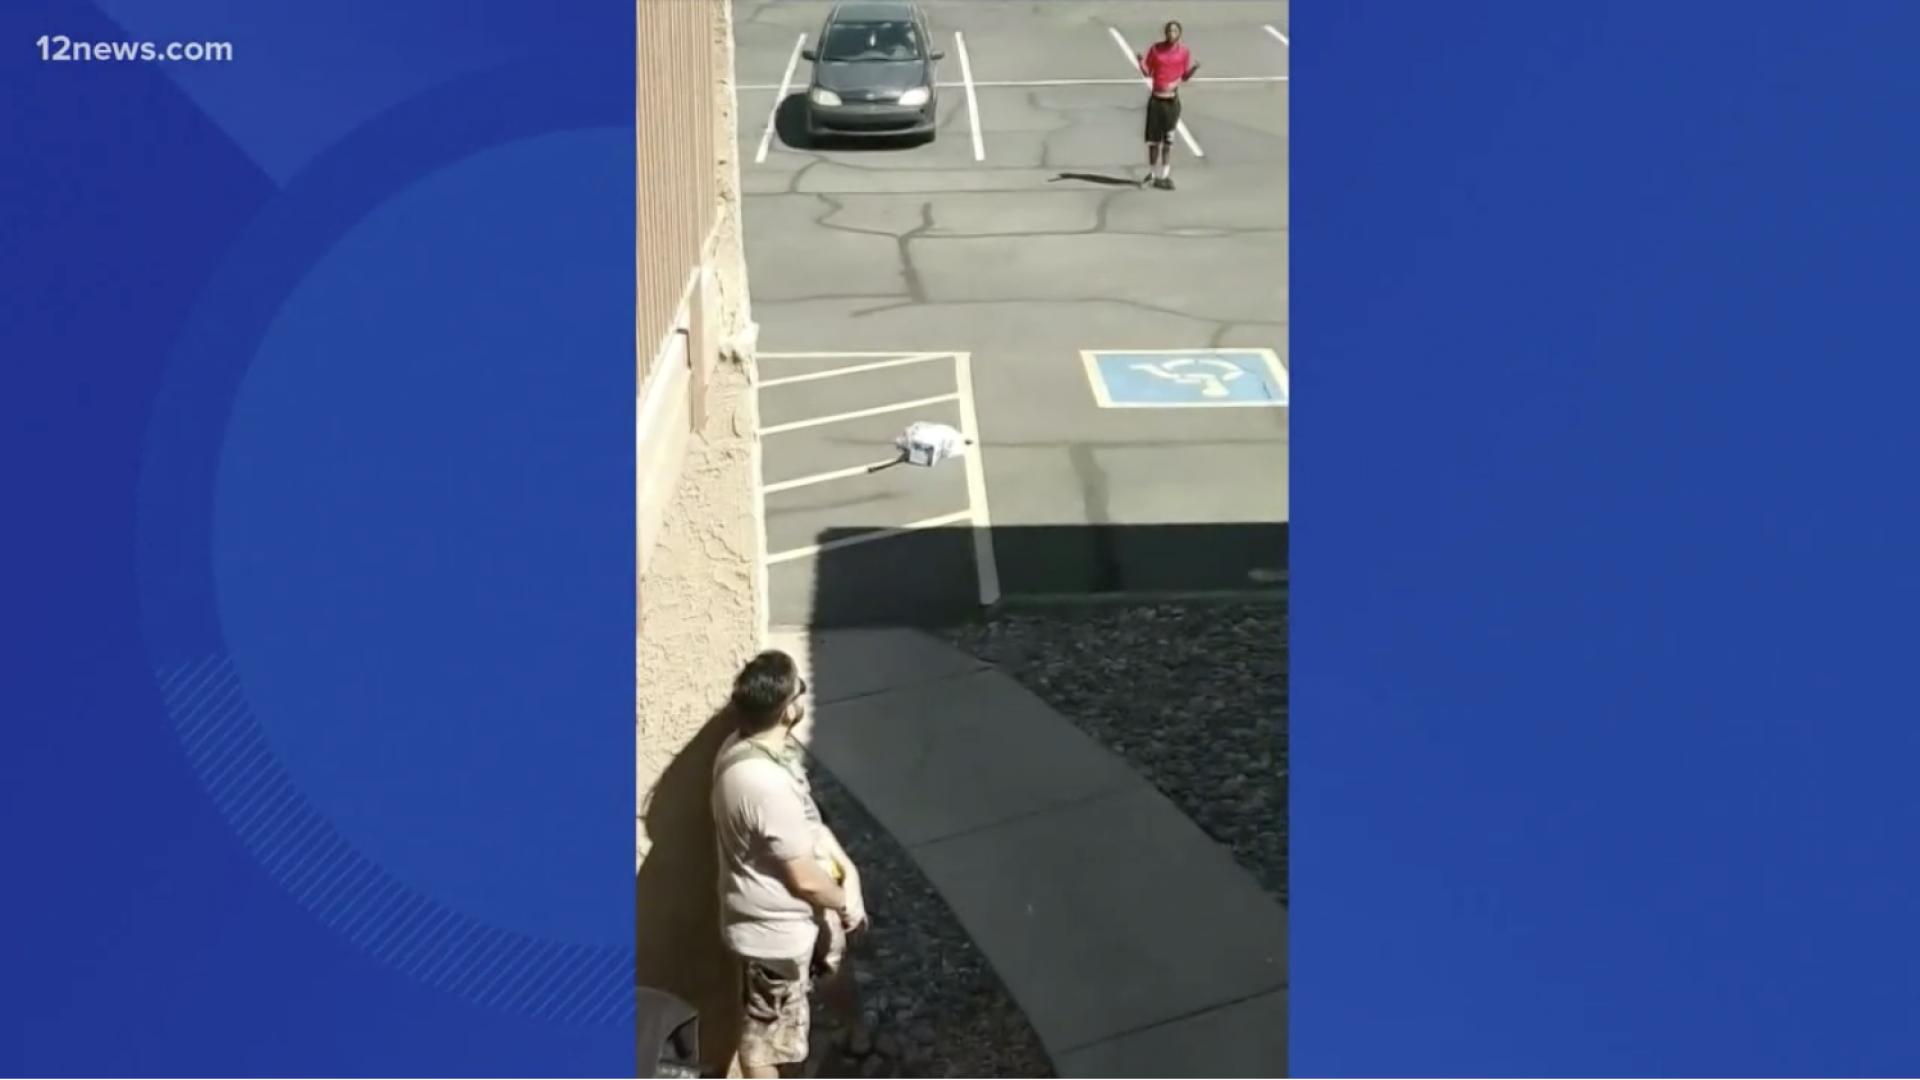 Arizona Man Arrested, Charged After Pulling Gun On Black DoorDash Driver